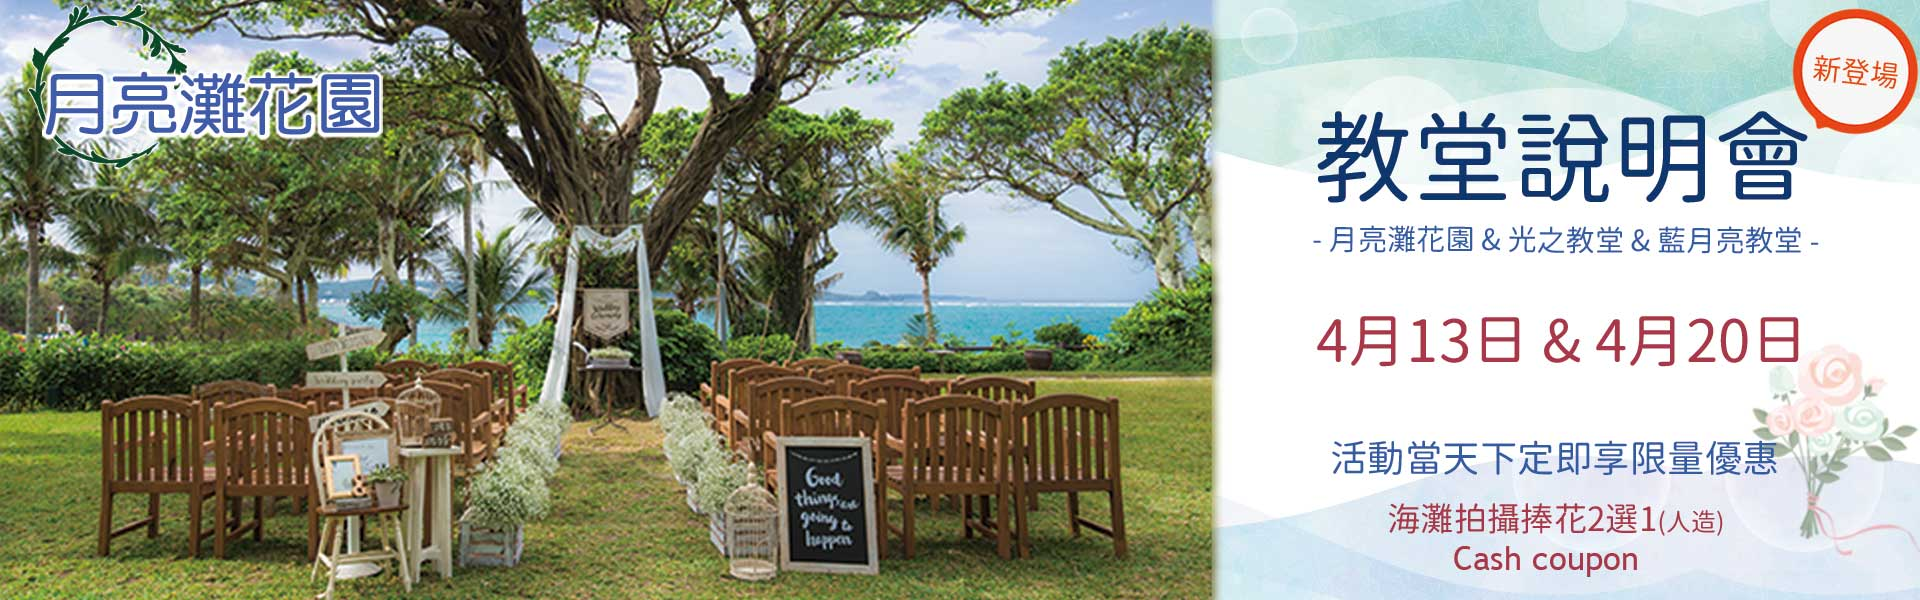 沖繩新推出~Moon Beach Garden Wedding & Voyage de Lumiere Chapel